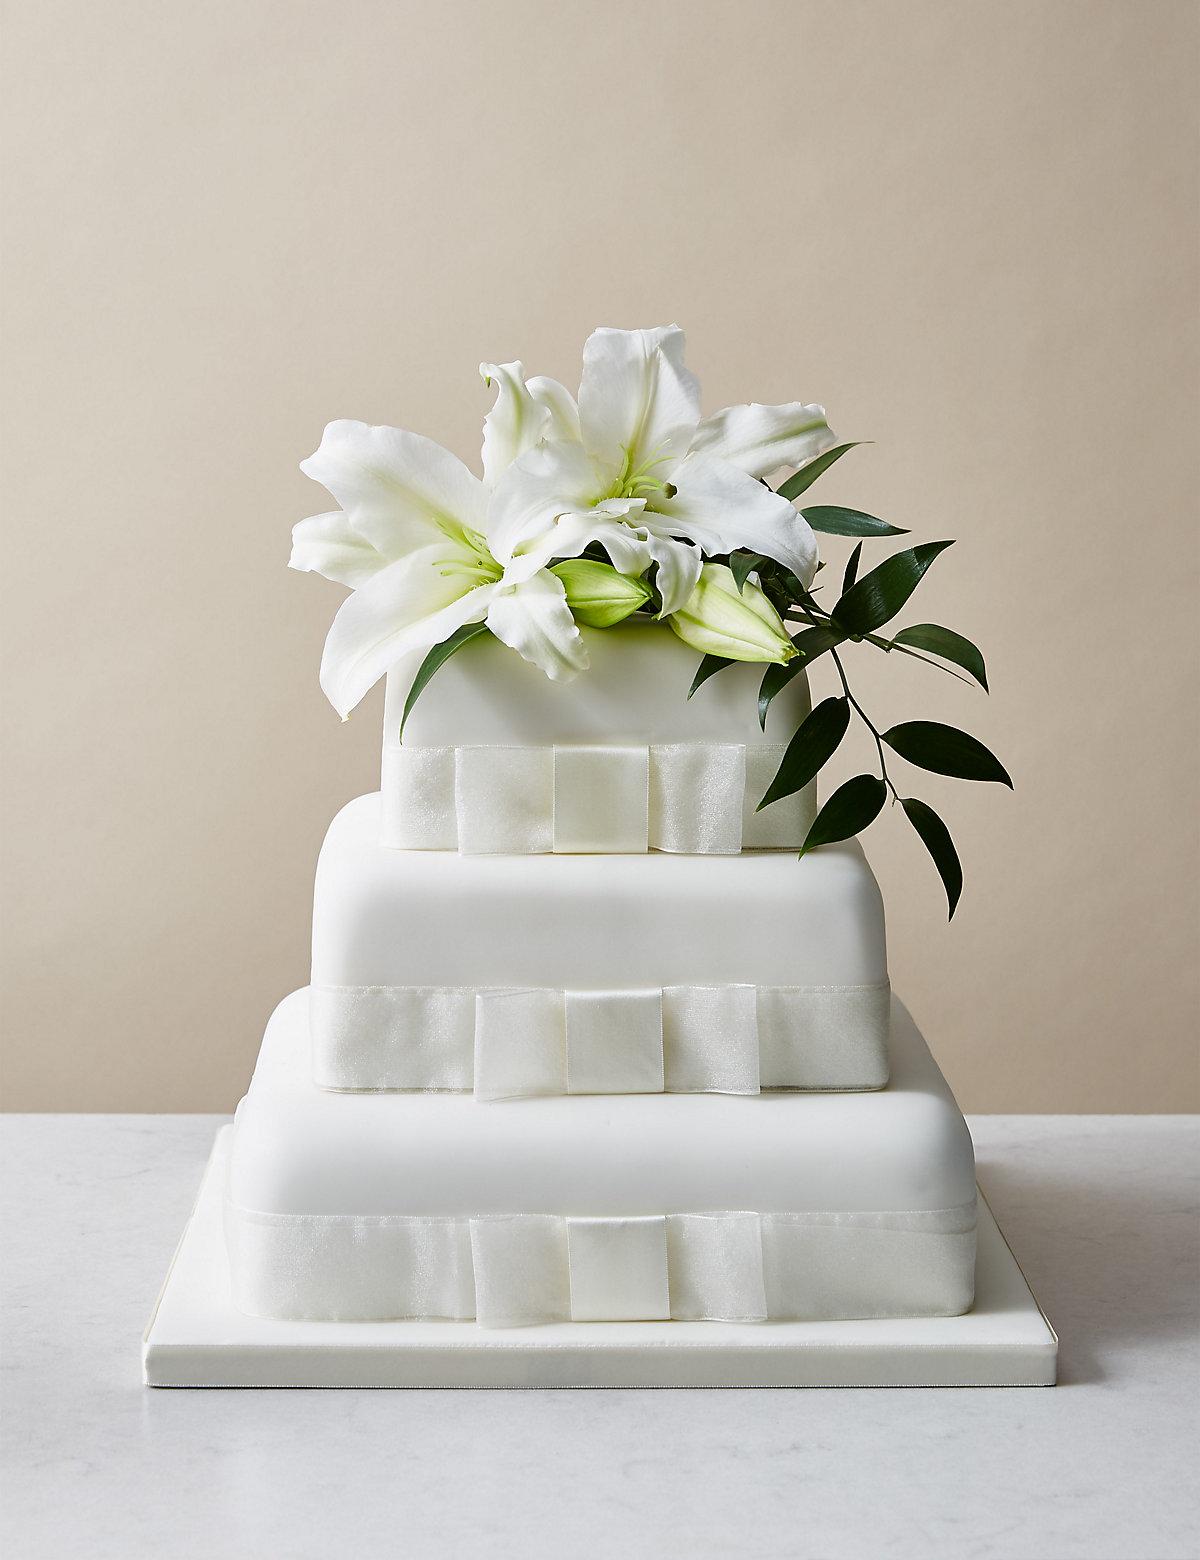 3 Tier Elegant Chocolate Wedding Cake